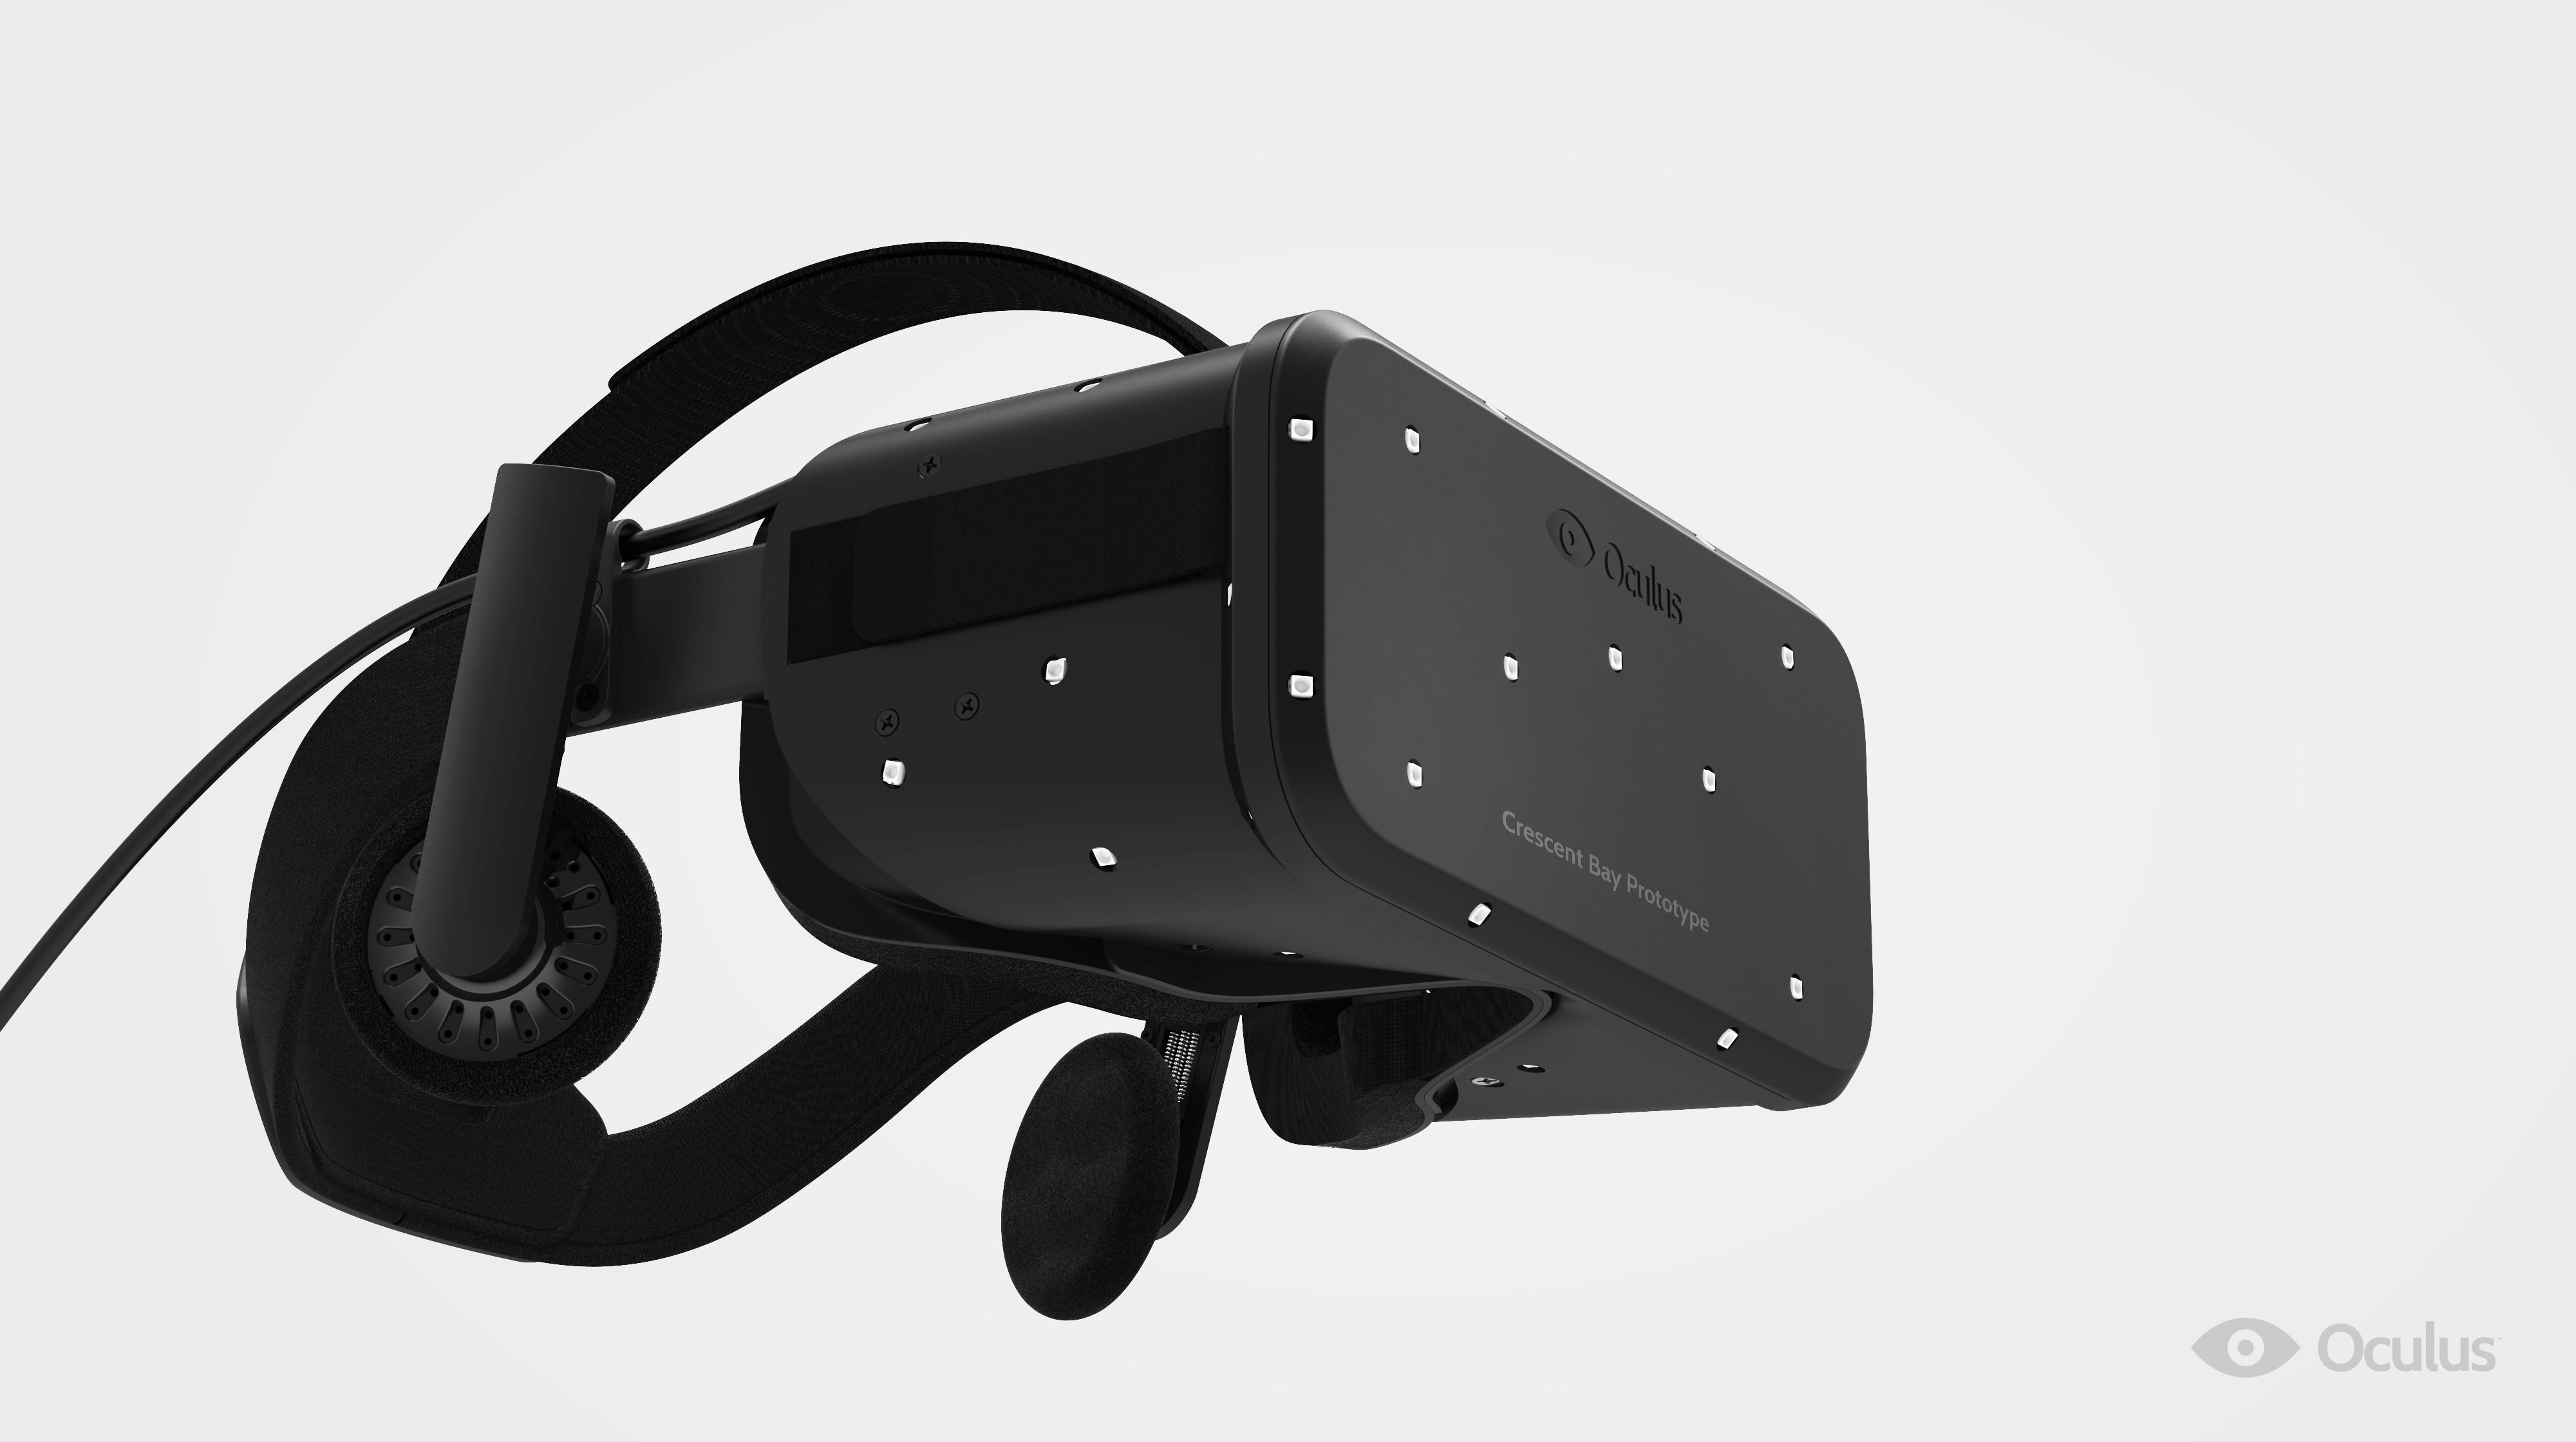 Oculus - Crescent Bay Prototype - 02